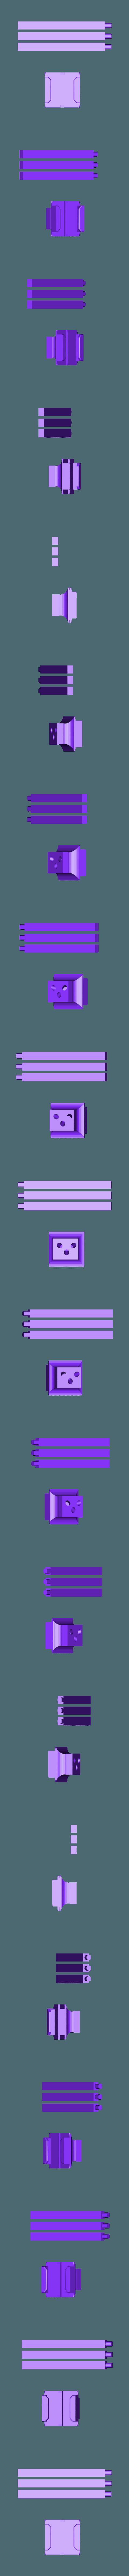 gopro_tripod.stl Download free STL file mini tripod for gopro hero 3 • 3D printer design, procreator3D